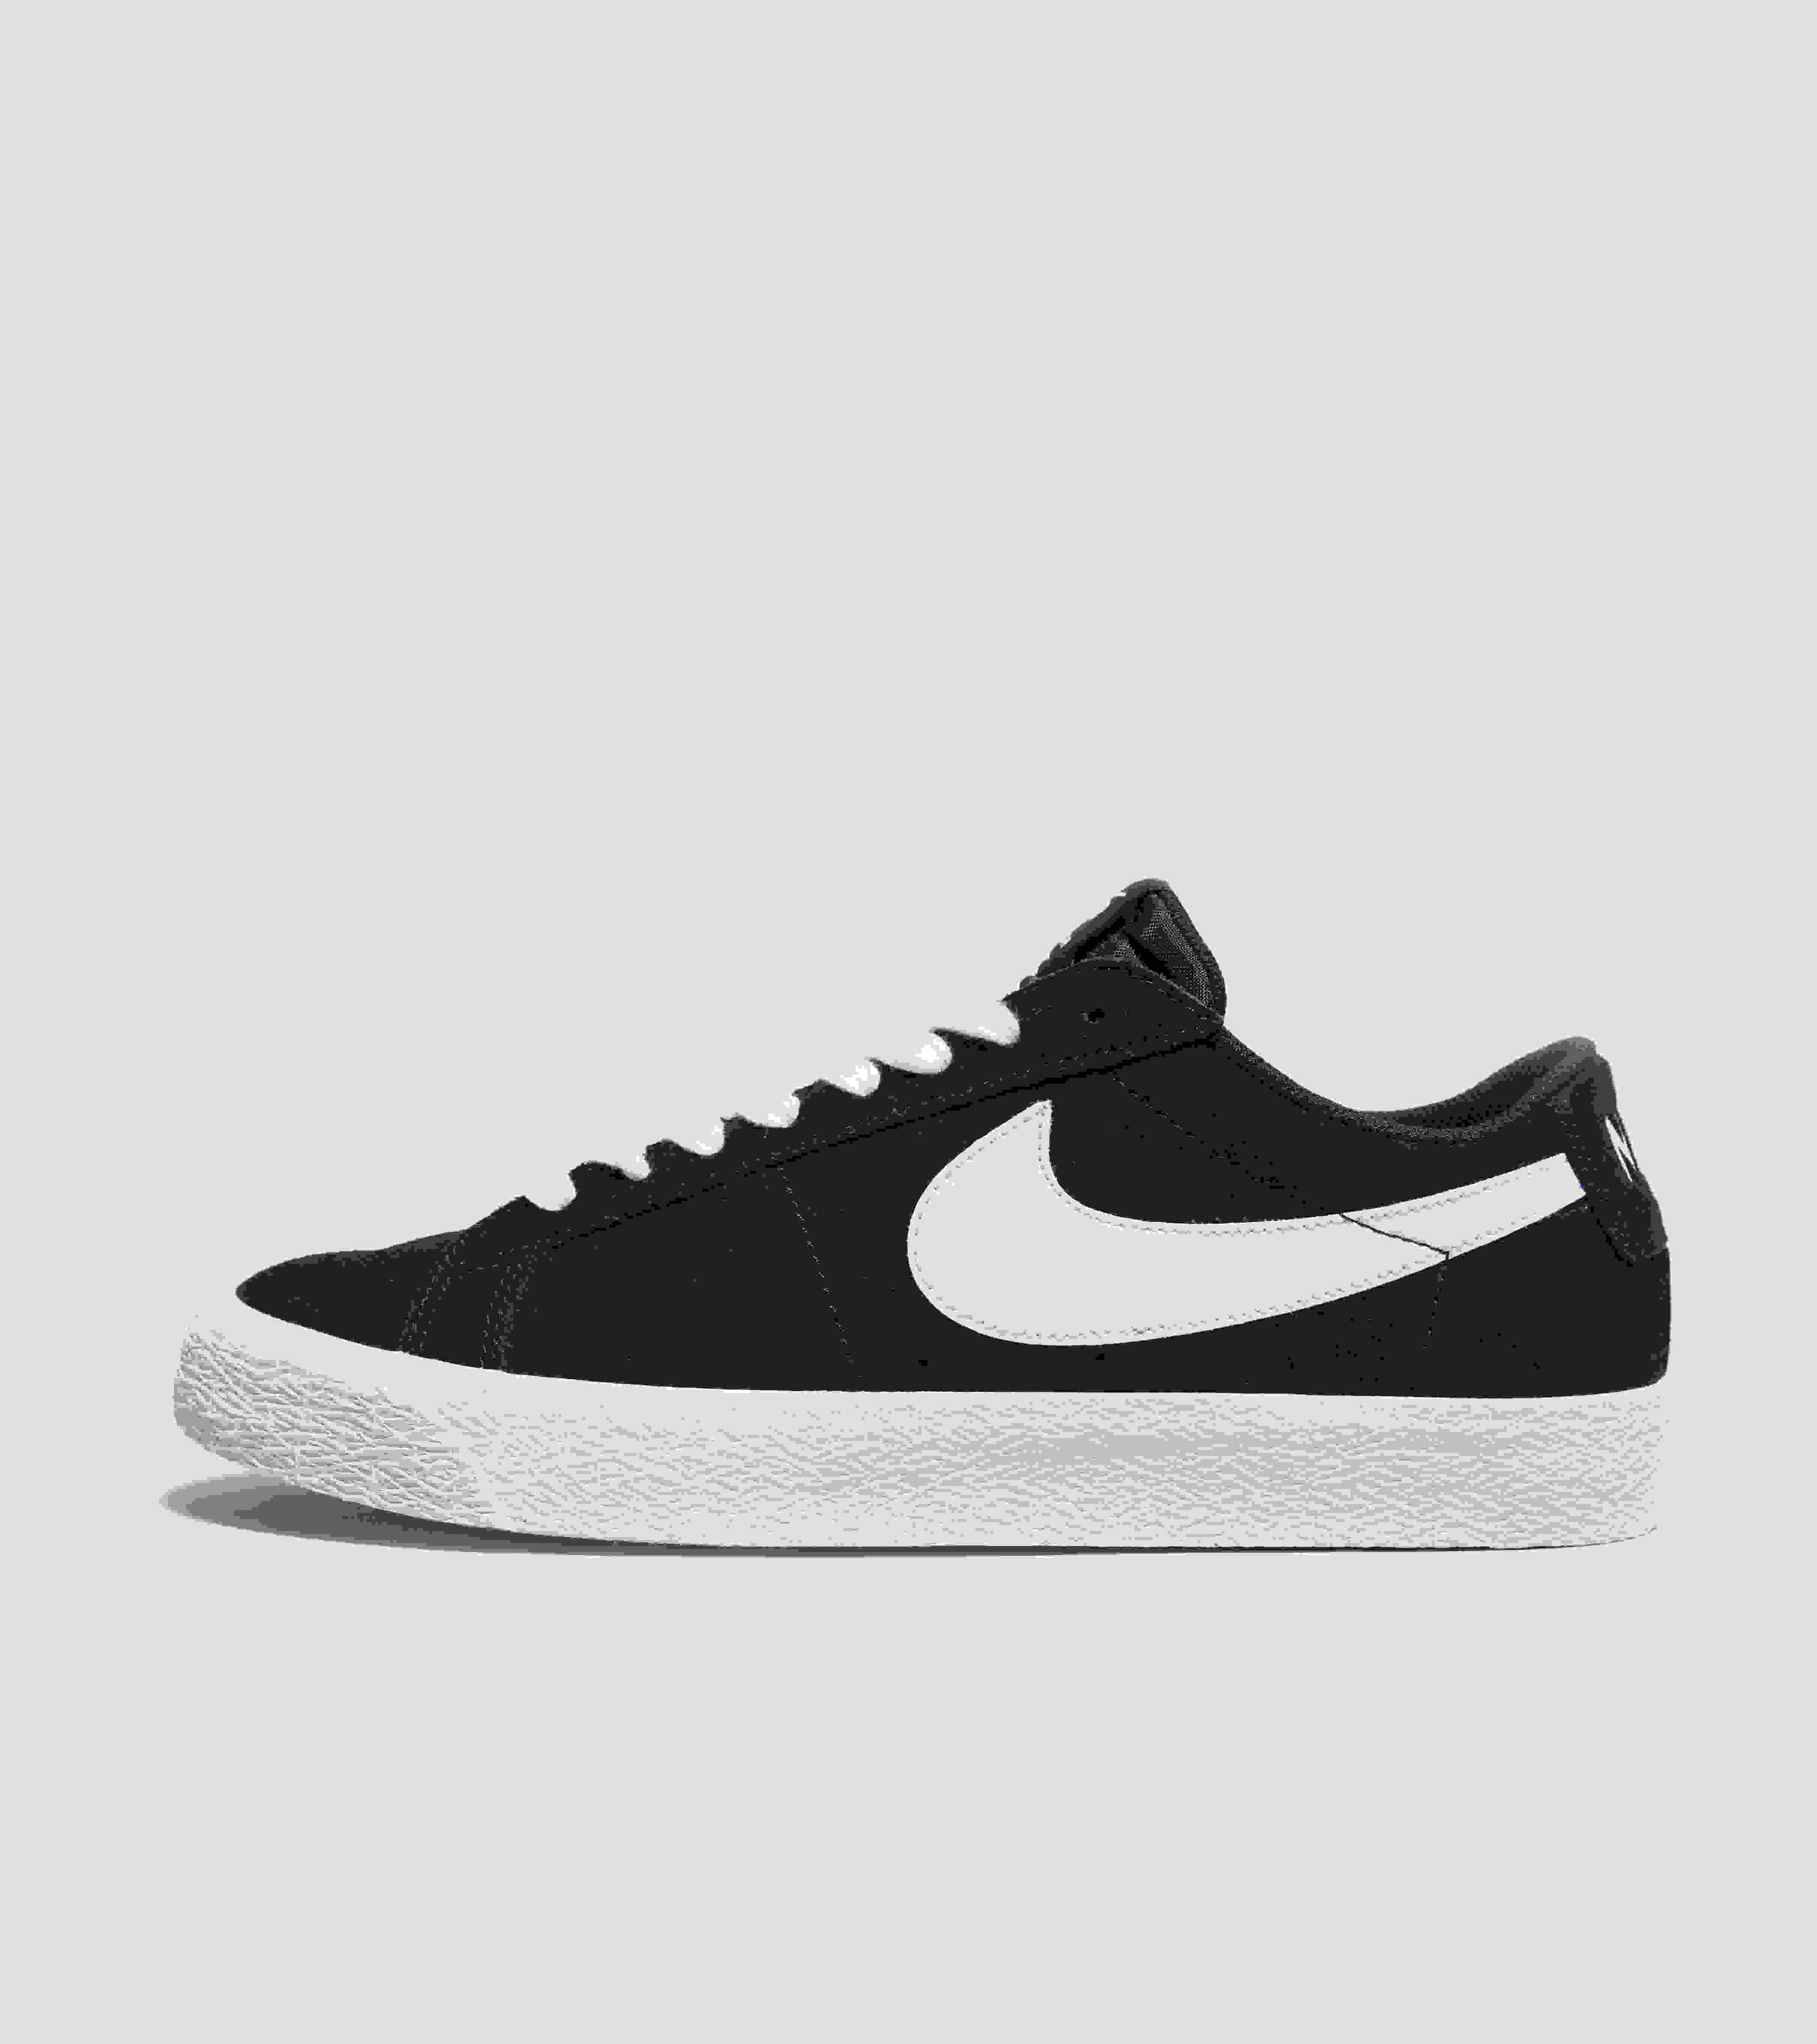 c952b015f09f Nike Zoom Kd 10 City Edition Kd 11 City Edition